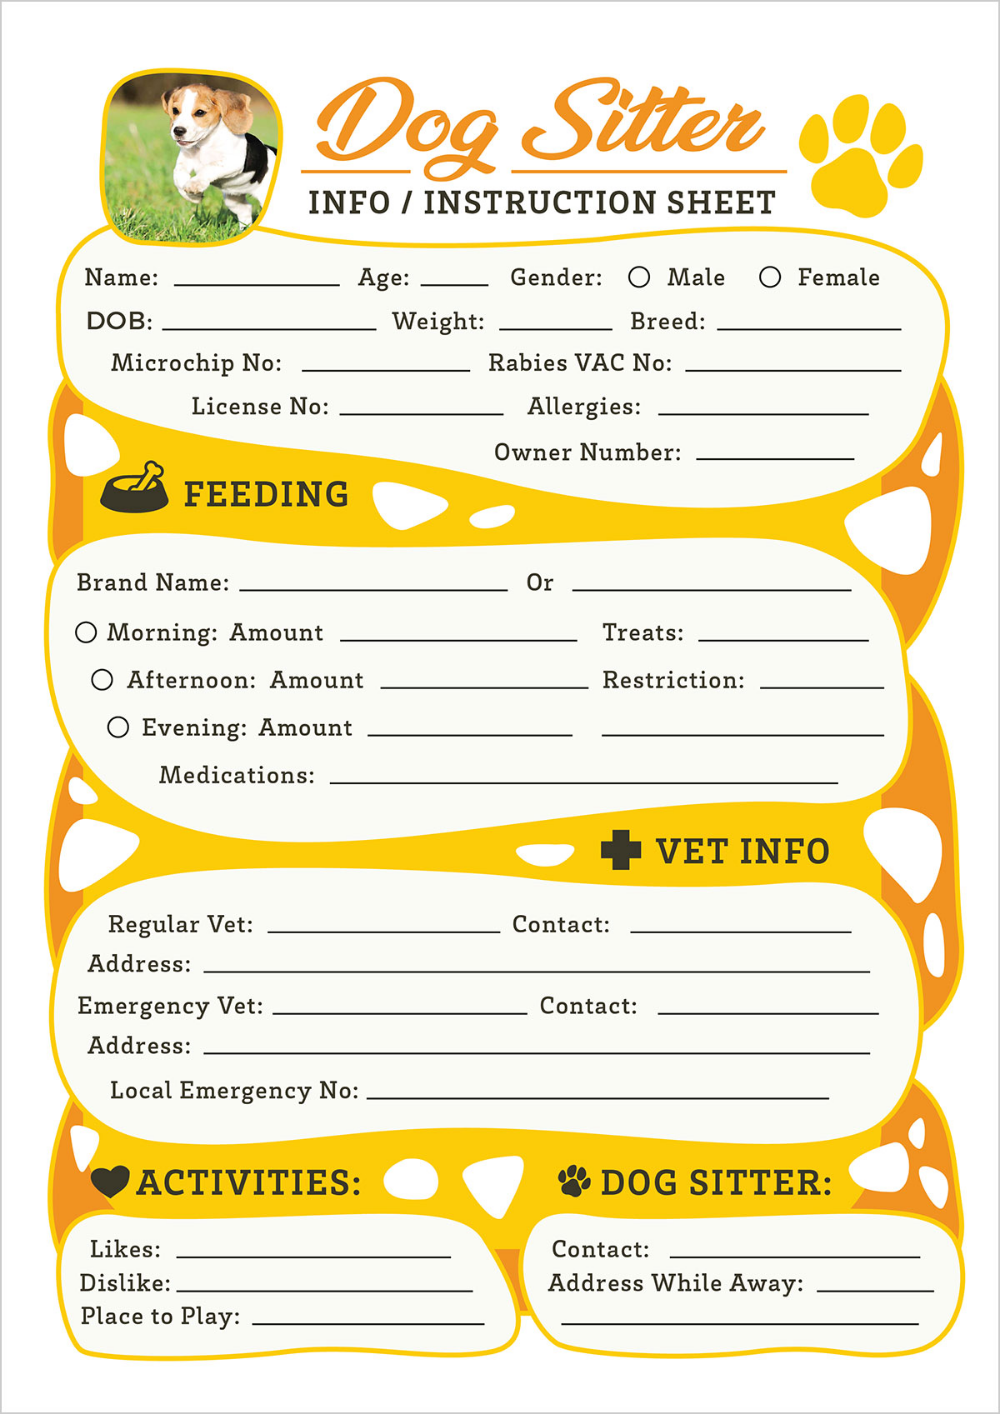 Free Dog Sitter Instruction Information Sheet Design Template Templates Free Design Design Template Sitter